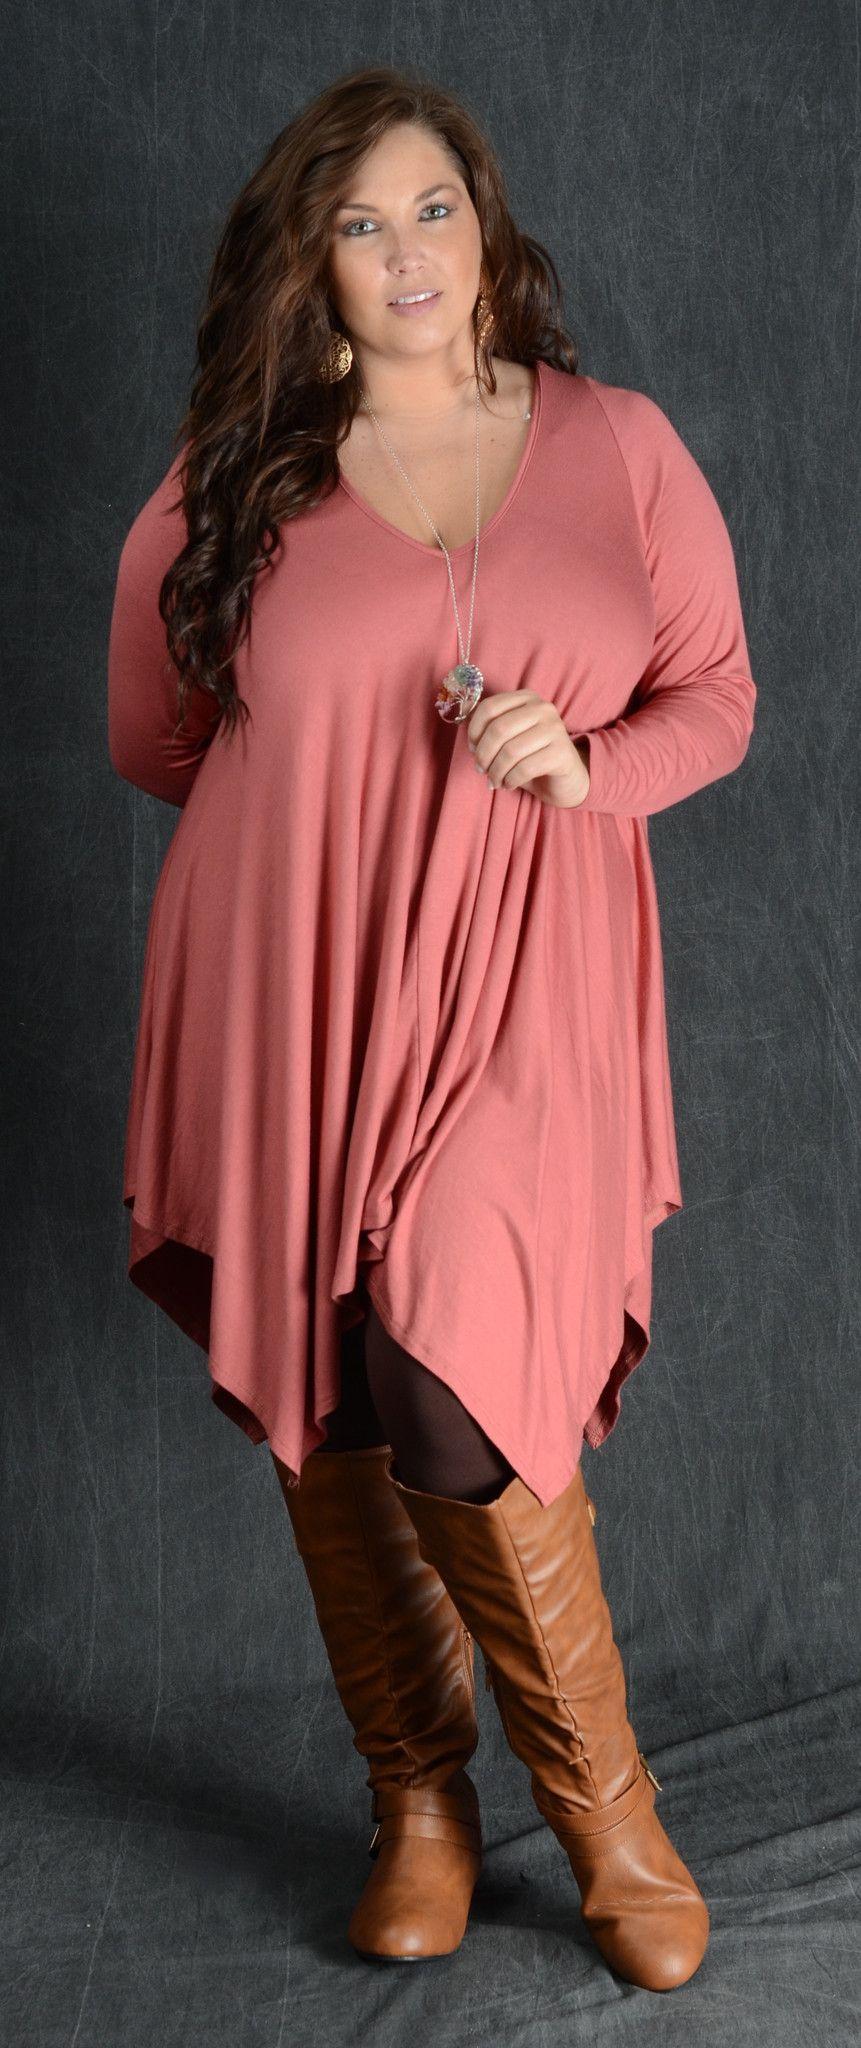 Rust V-Neck Tunic Dress | Thicke Madame Fashion | Pinterest ...